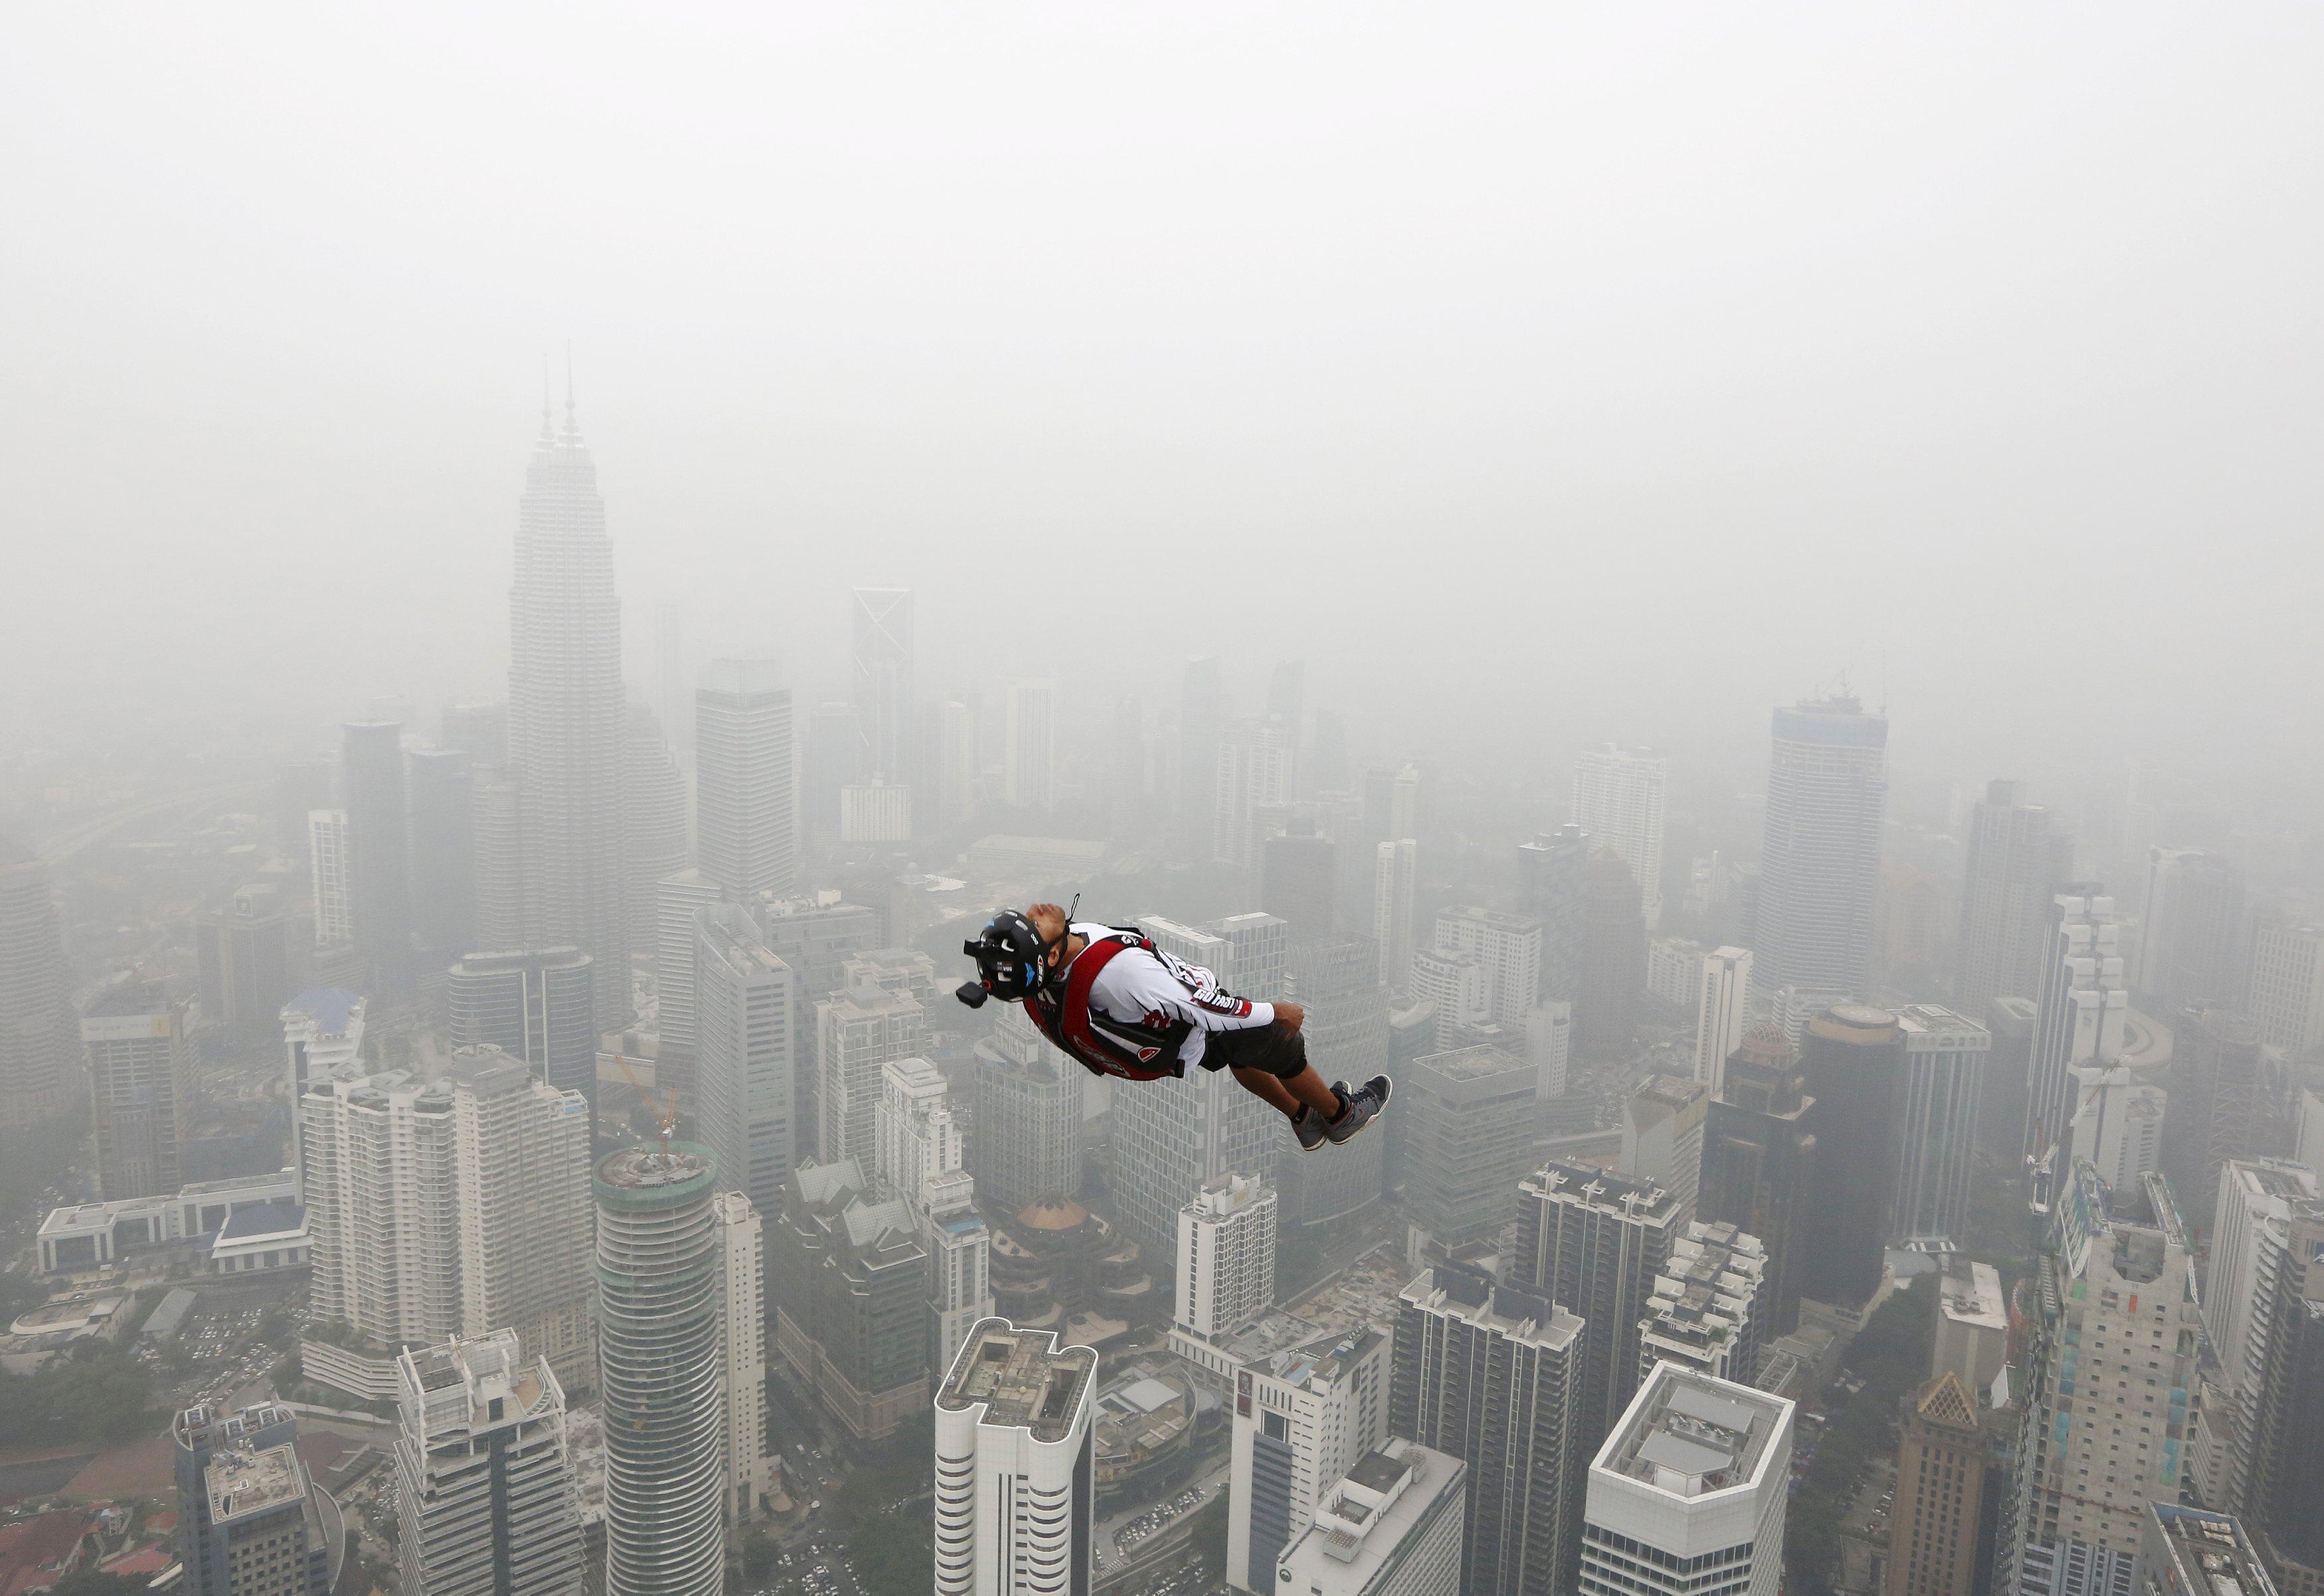 Penerjun BASE melompat dari Menara Kuala Lumpur setinggi 300 meter dalam acara Lompat Menara Internasional dengan lebih dari 100 orang ikut serta, di hari berkabut di Kuala Lumpur, Malaysia, Jumat (2/10). Penebangan dan pembakaran lahan untuk pertanian di wilayah Indonesia membuat Malaysia dan Singapura diselimuti kabut asap selama beberapa pekan. ANTARA FOTO/REUTERS/Olivia Harris.